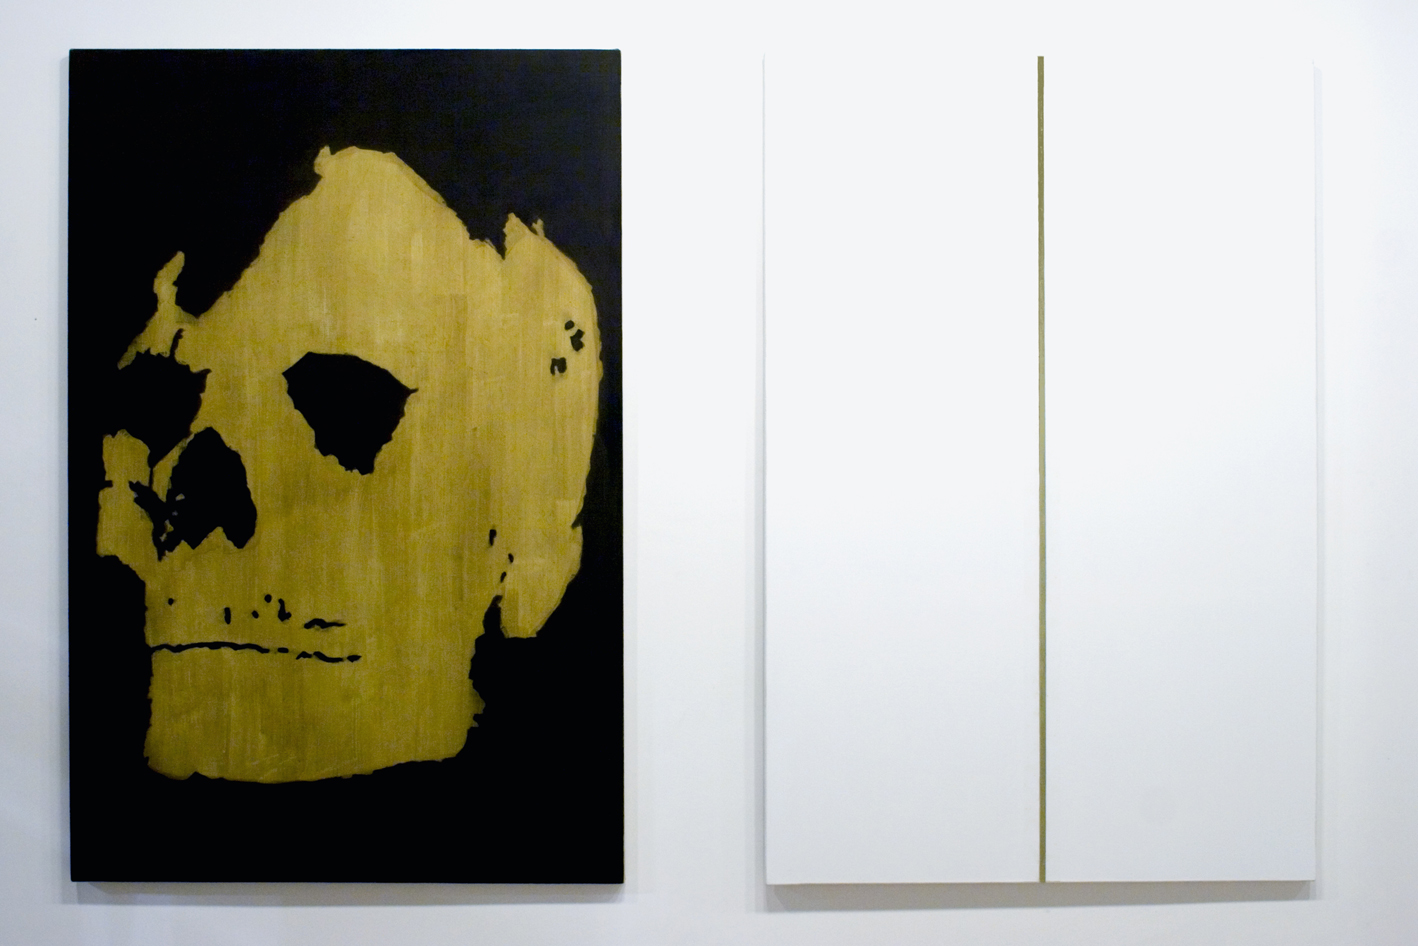 Gabriel Truan st tecnica mixta sobre tela (2x) 146 x 97 cm exp. Arte Contemporaneo Asturiano museo barjola Gijon 2007